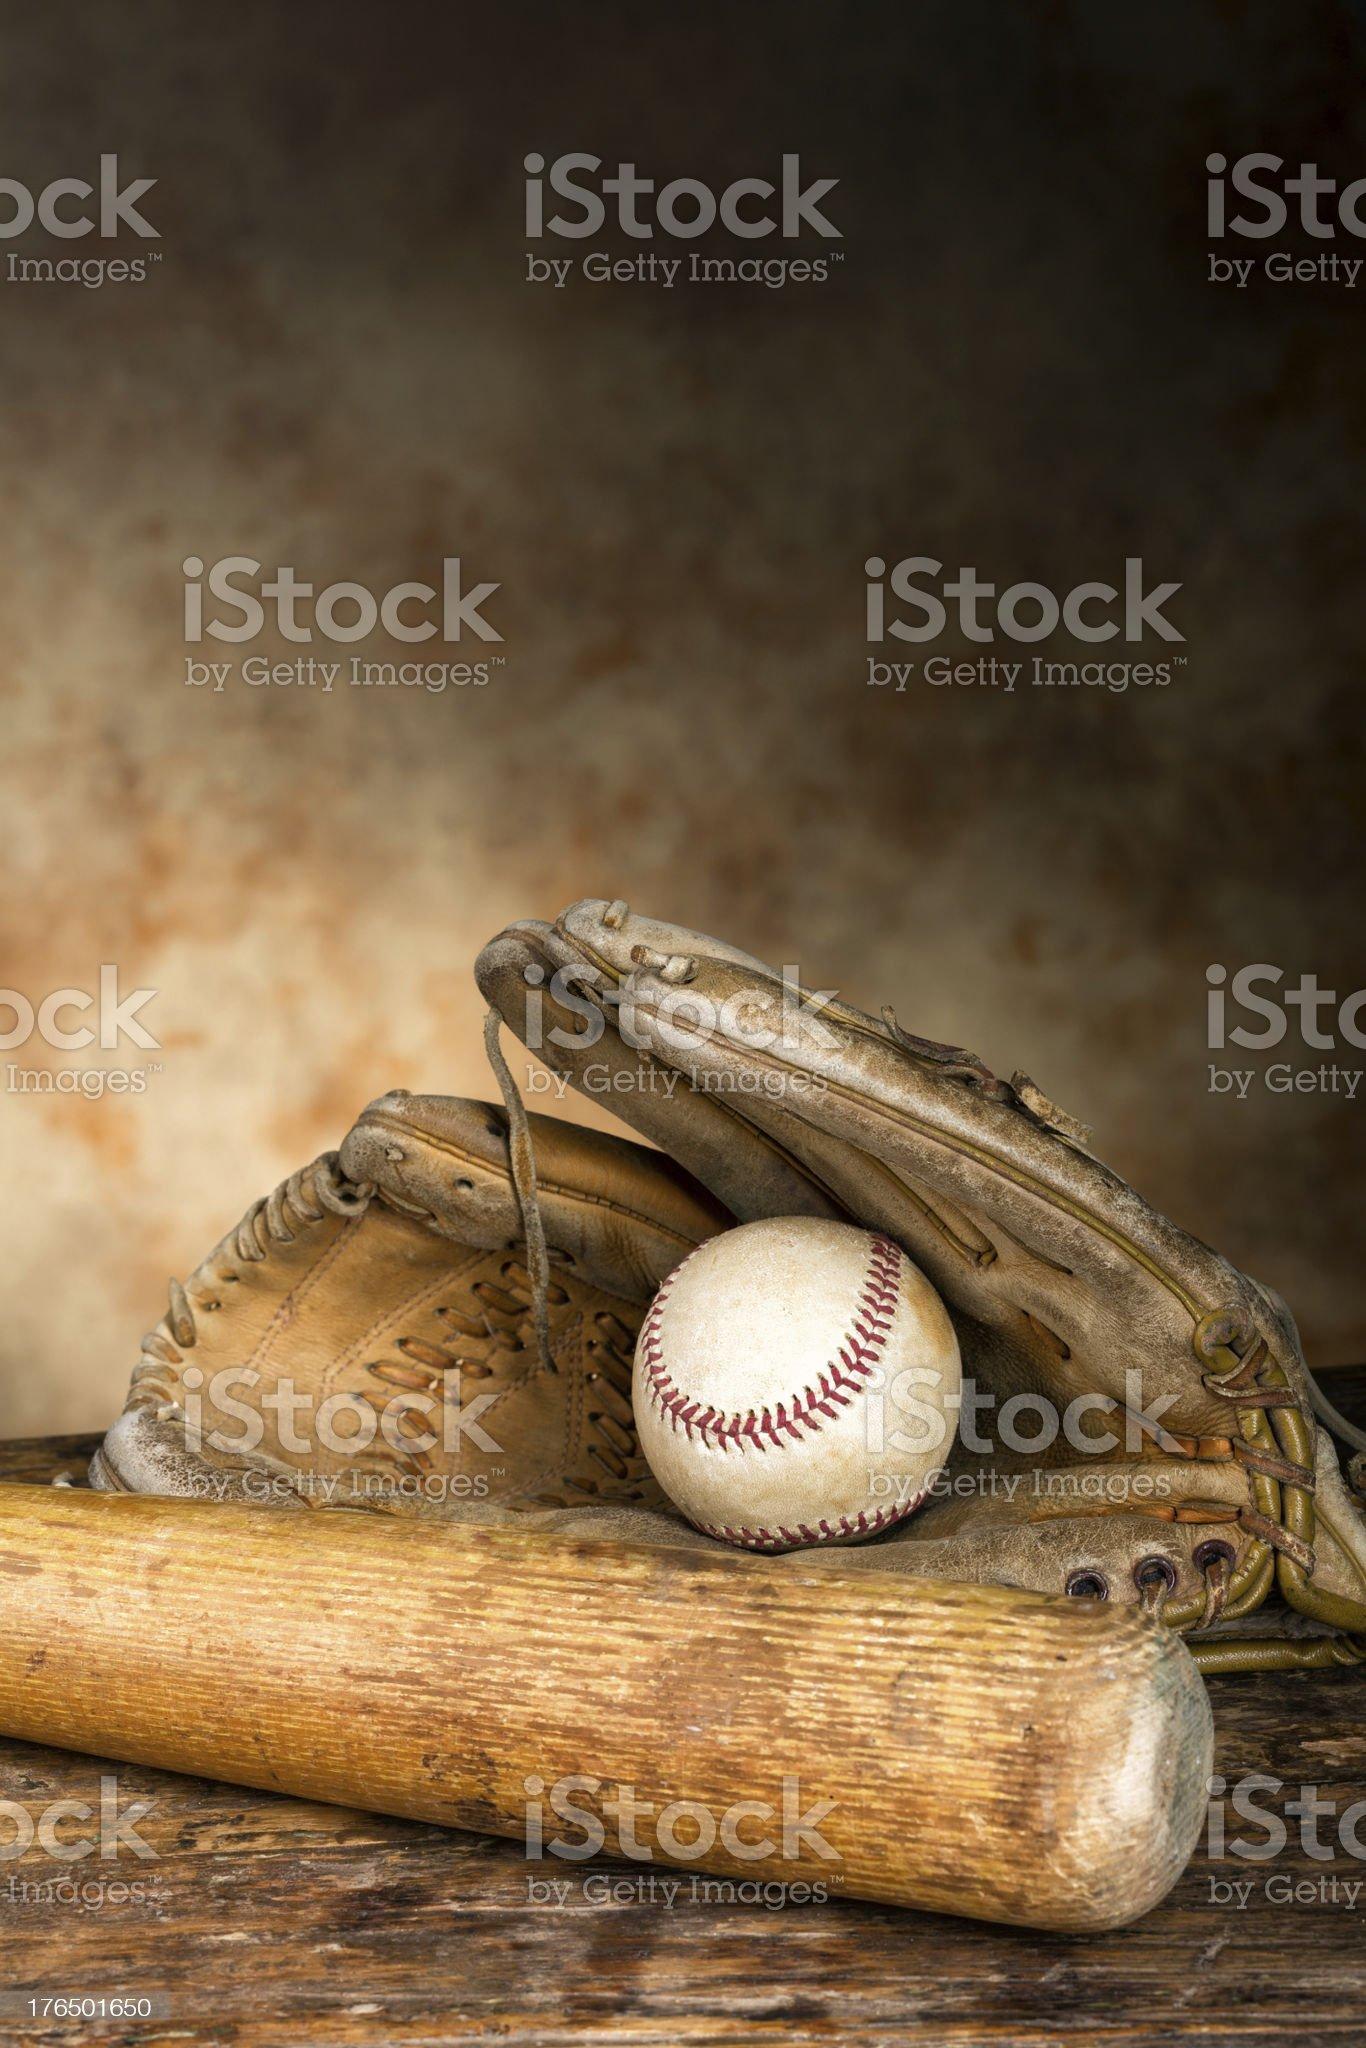 Antique baseball gear royalty-free stock photo